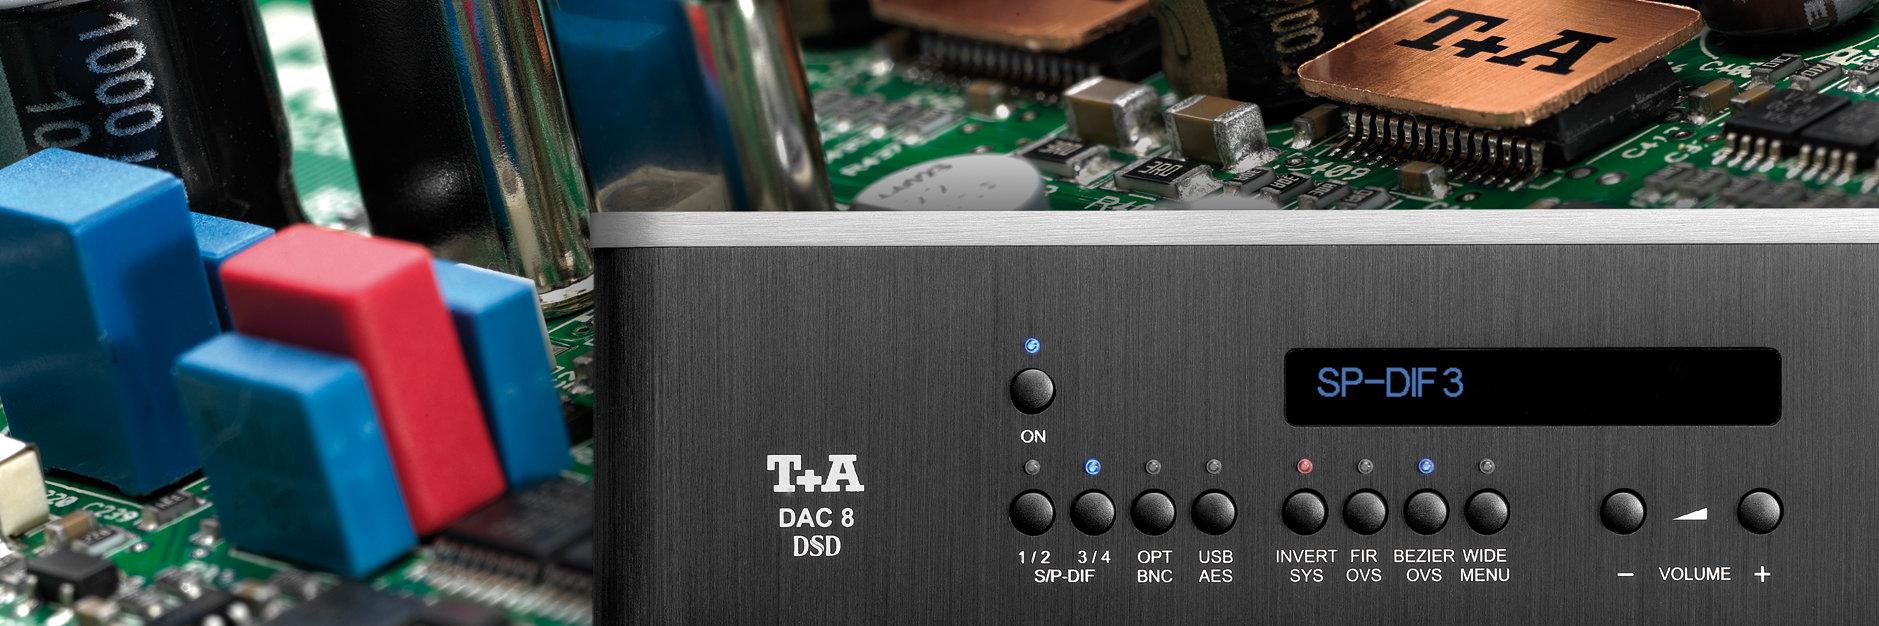 image hifi - T+A DAC 8 DSD